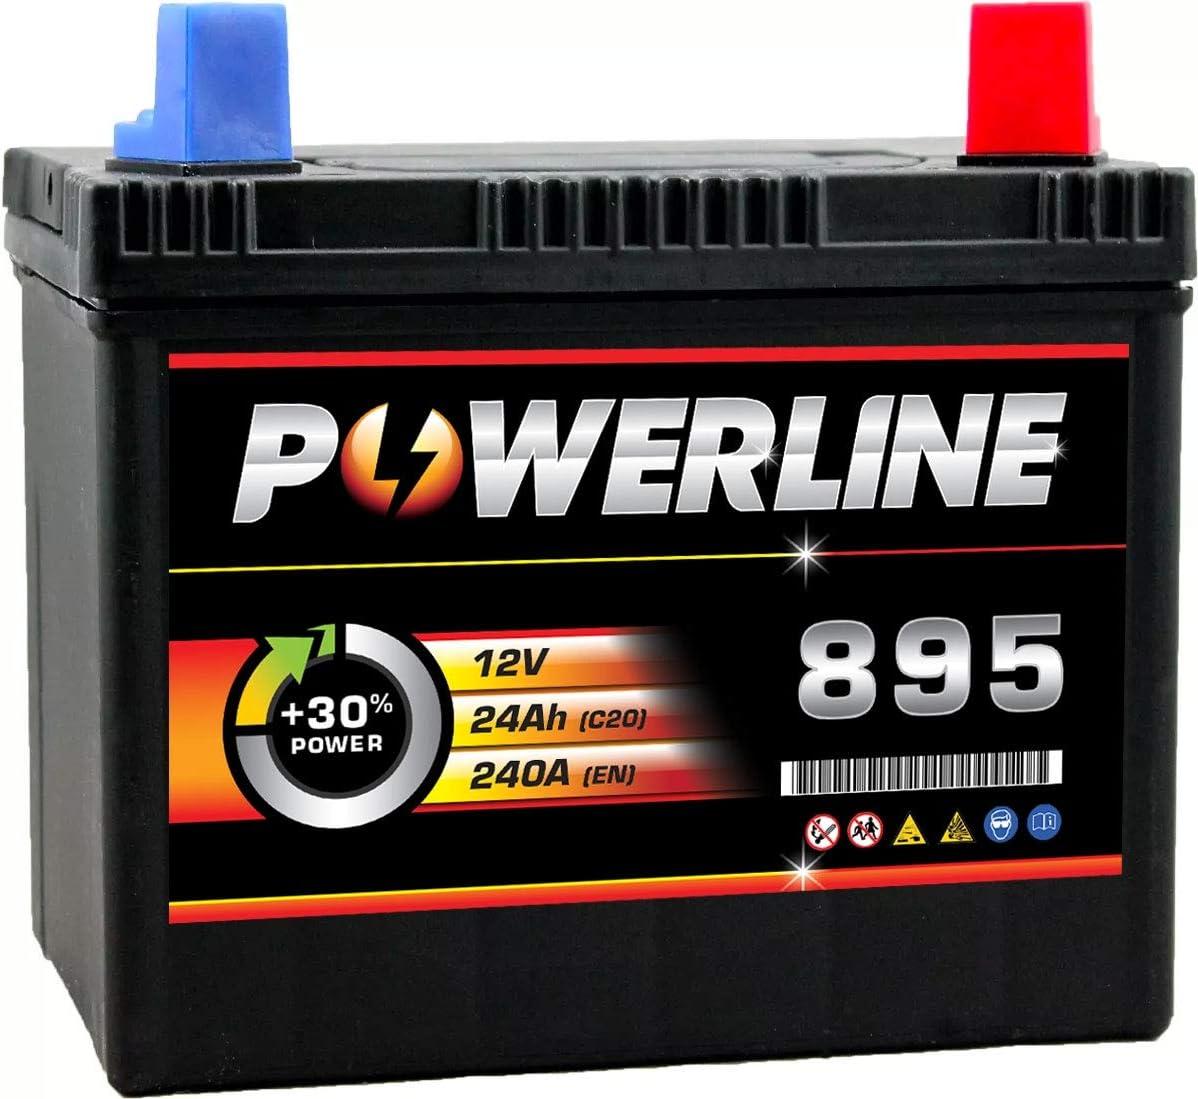 895 Powerline Lawnmower Batterie 12V